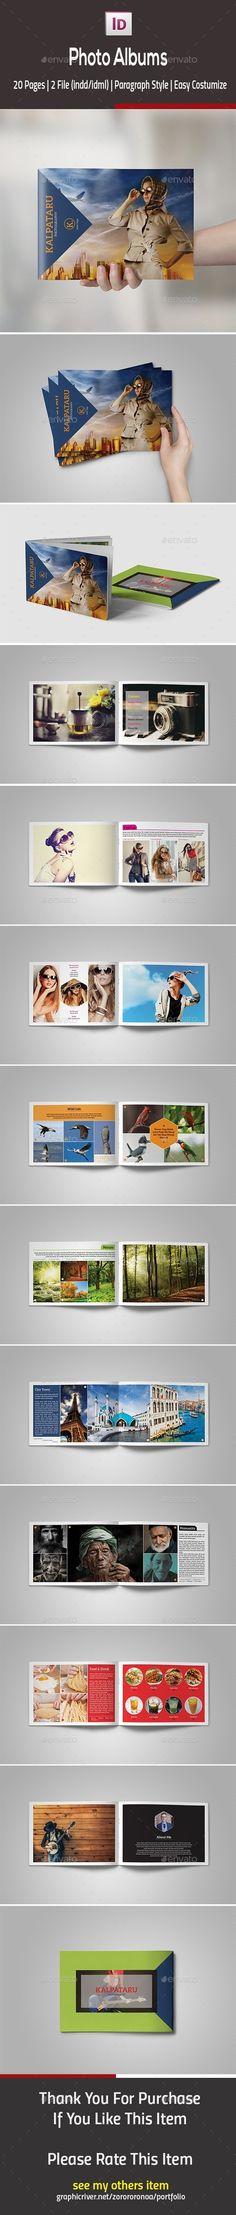 Photo Albums Template InDesign INDD #design Download: http://graphicriver.net/item/photo-albums/13243231?ref=ksioks